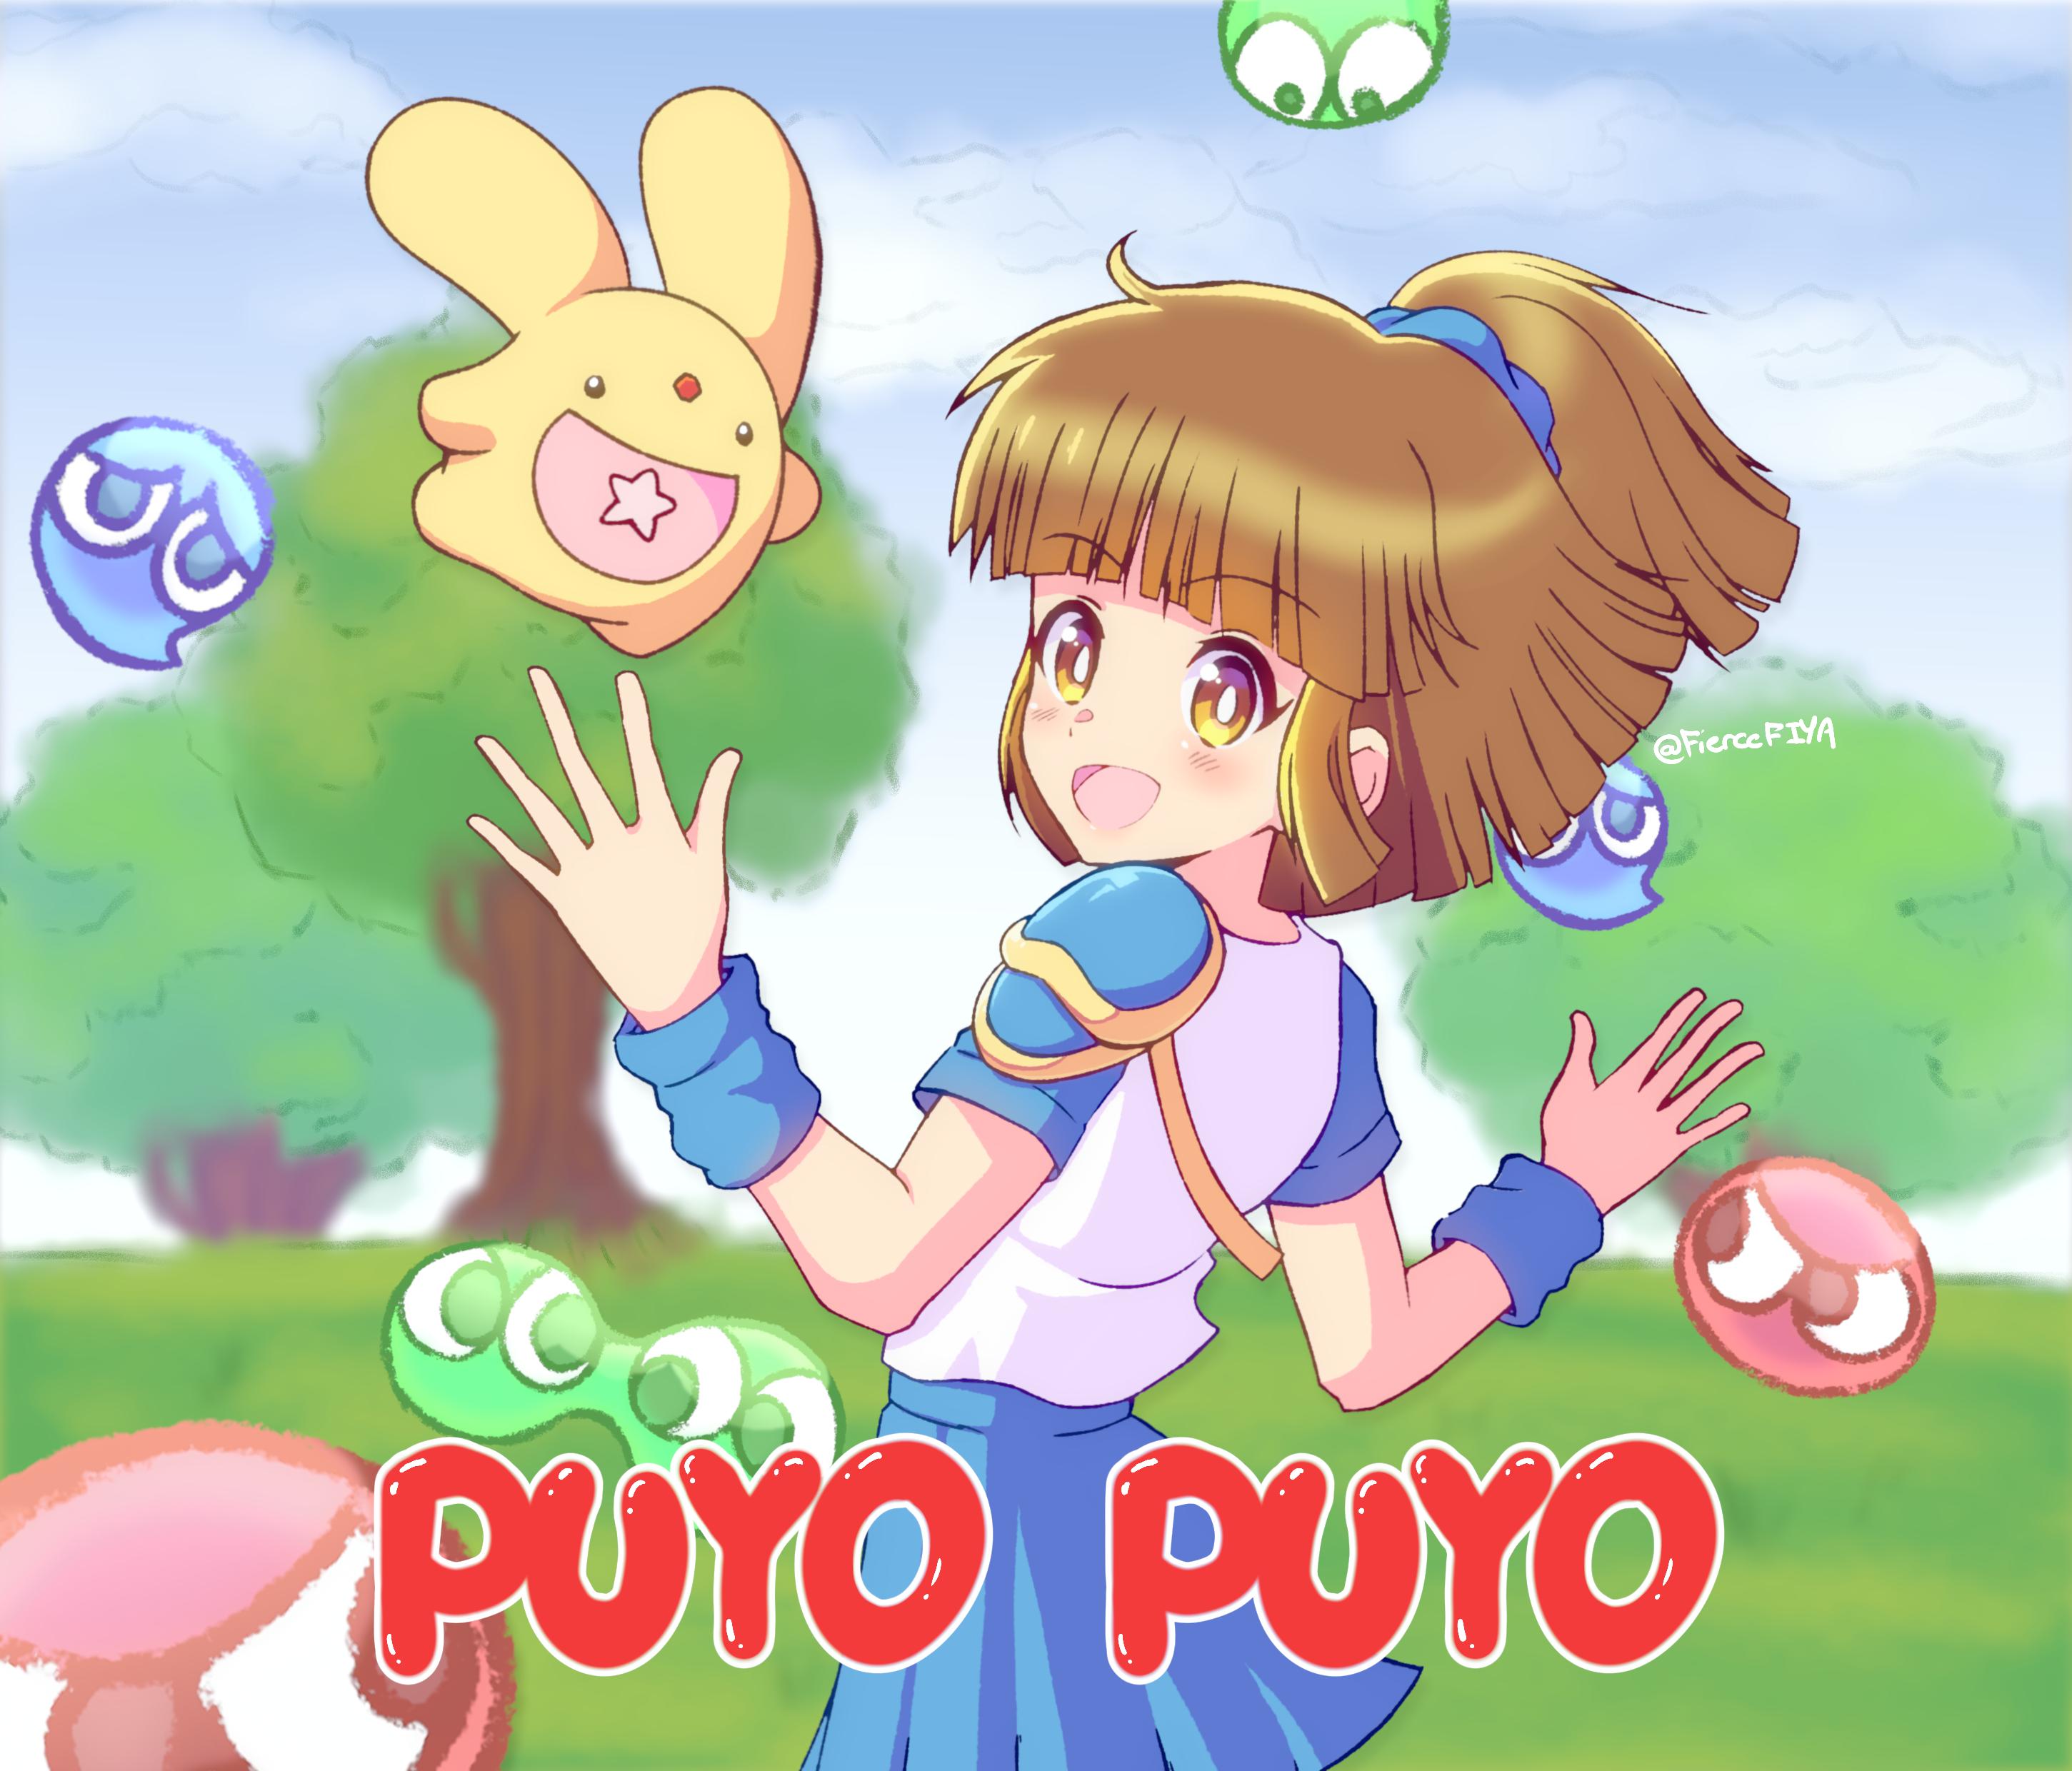 Puyo Puyo PC-98 Redraw